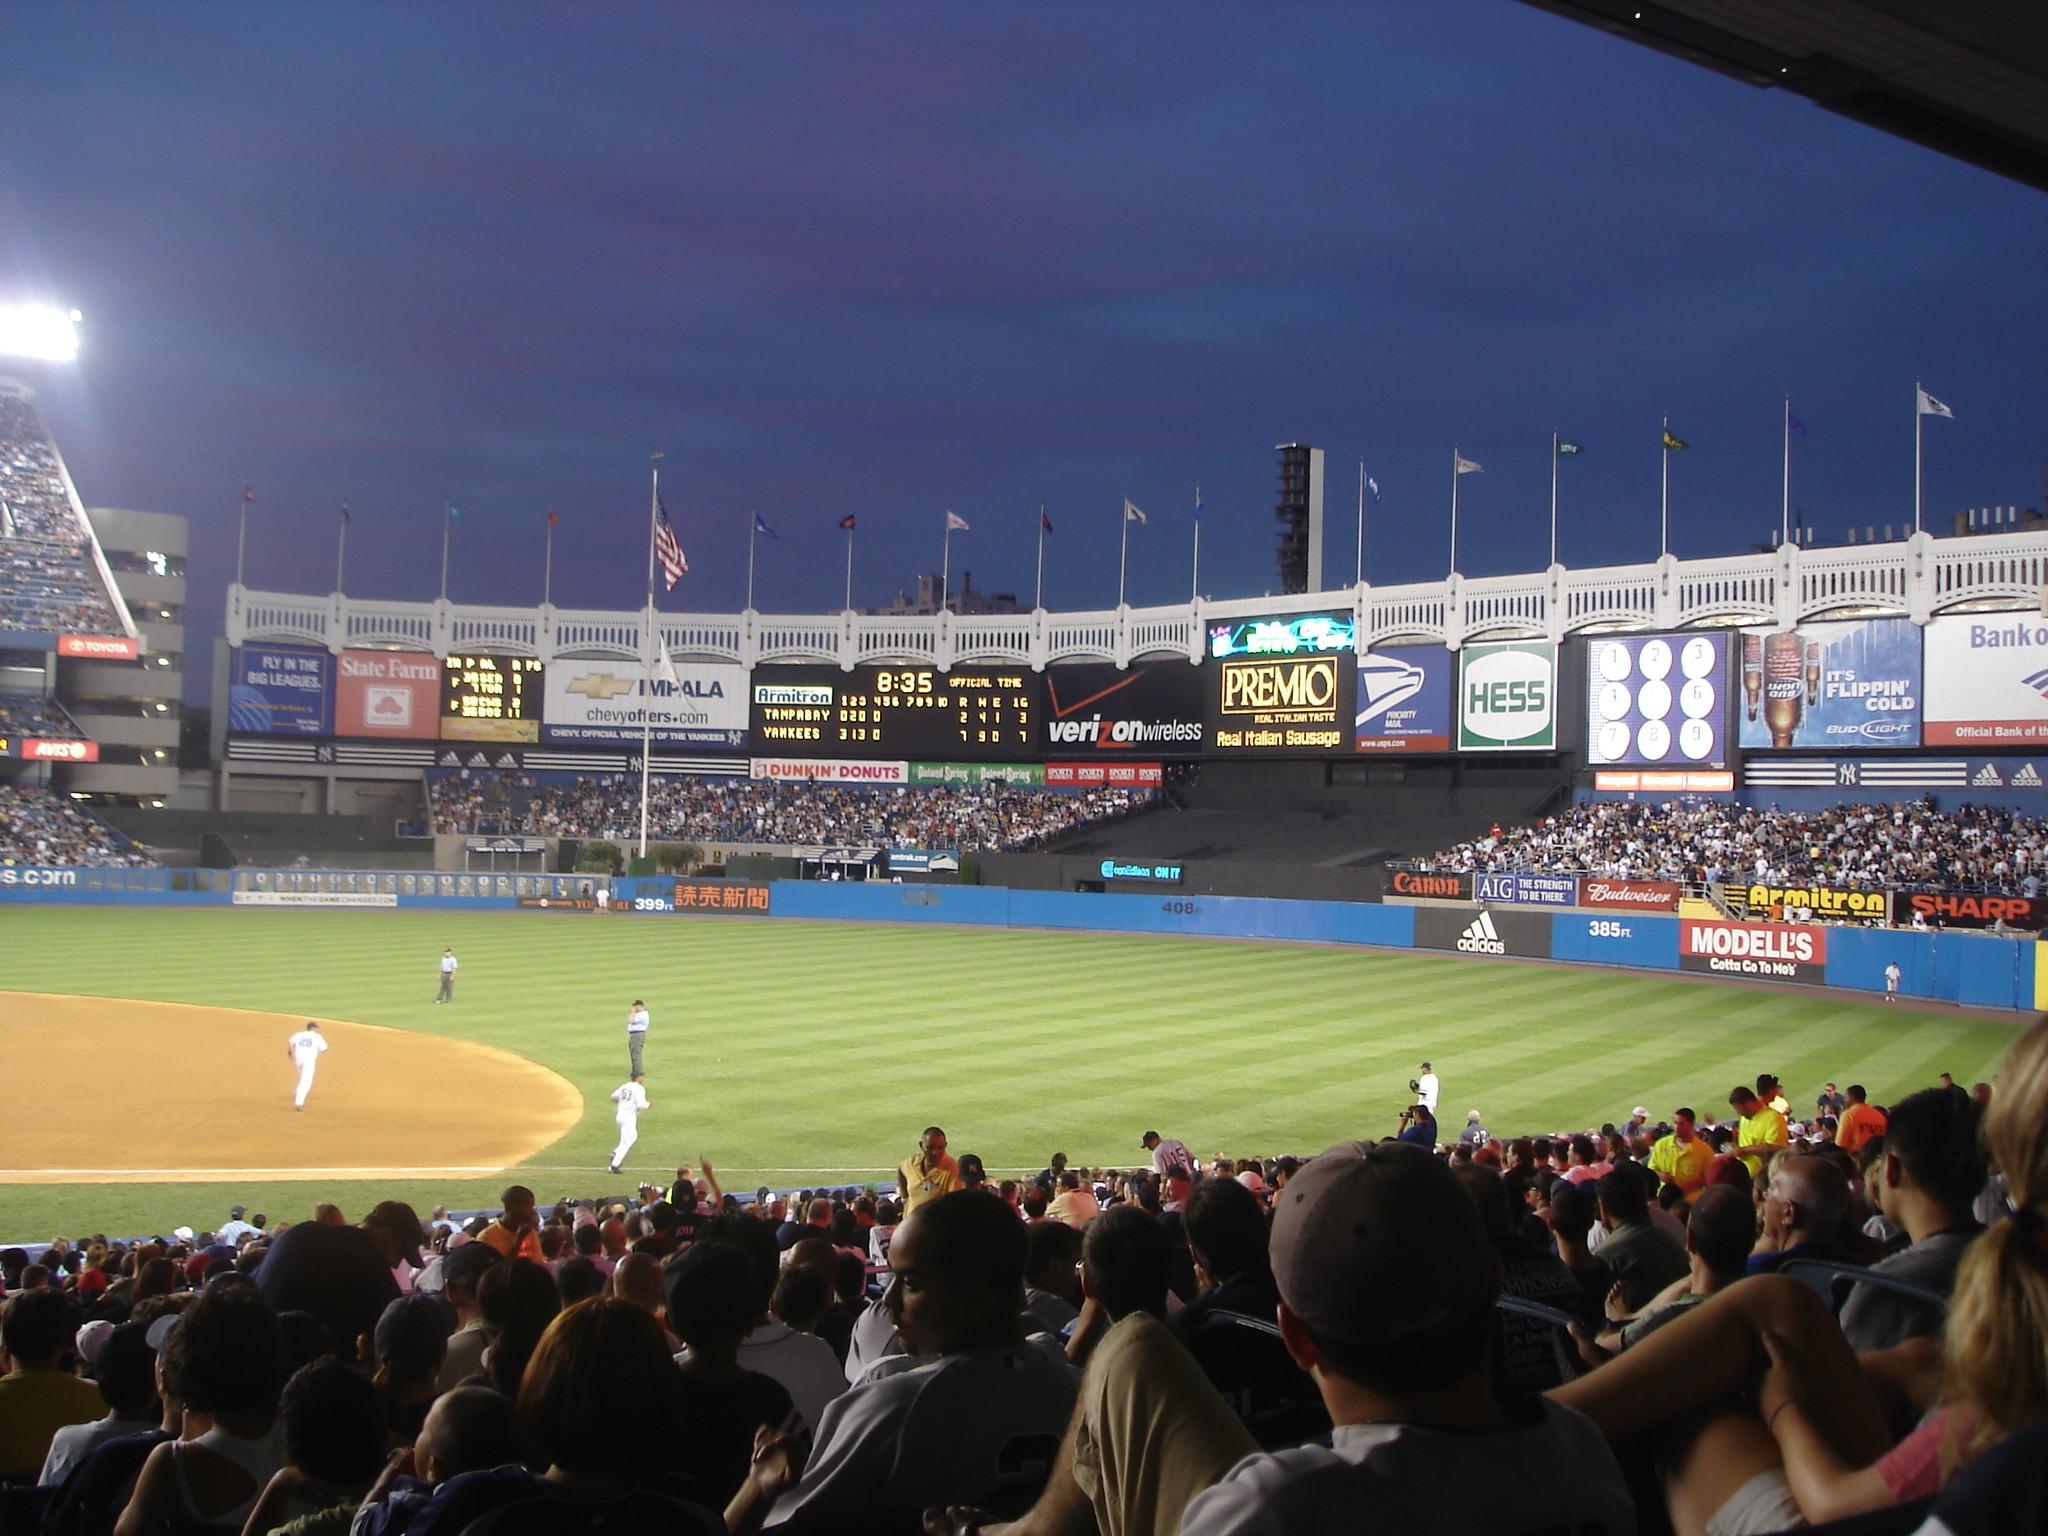 Res: 2048x1536, HD Widescreen Backgrounds New York Yankees Stadium Photos